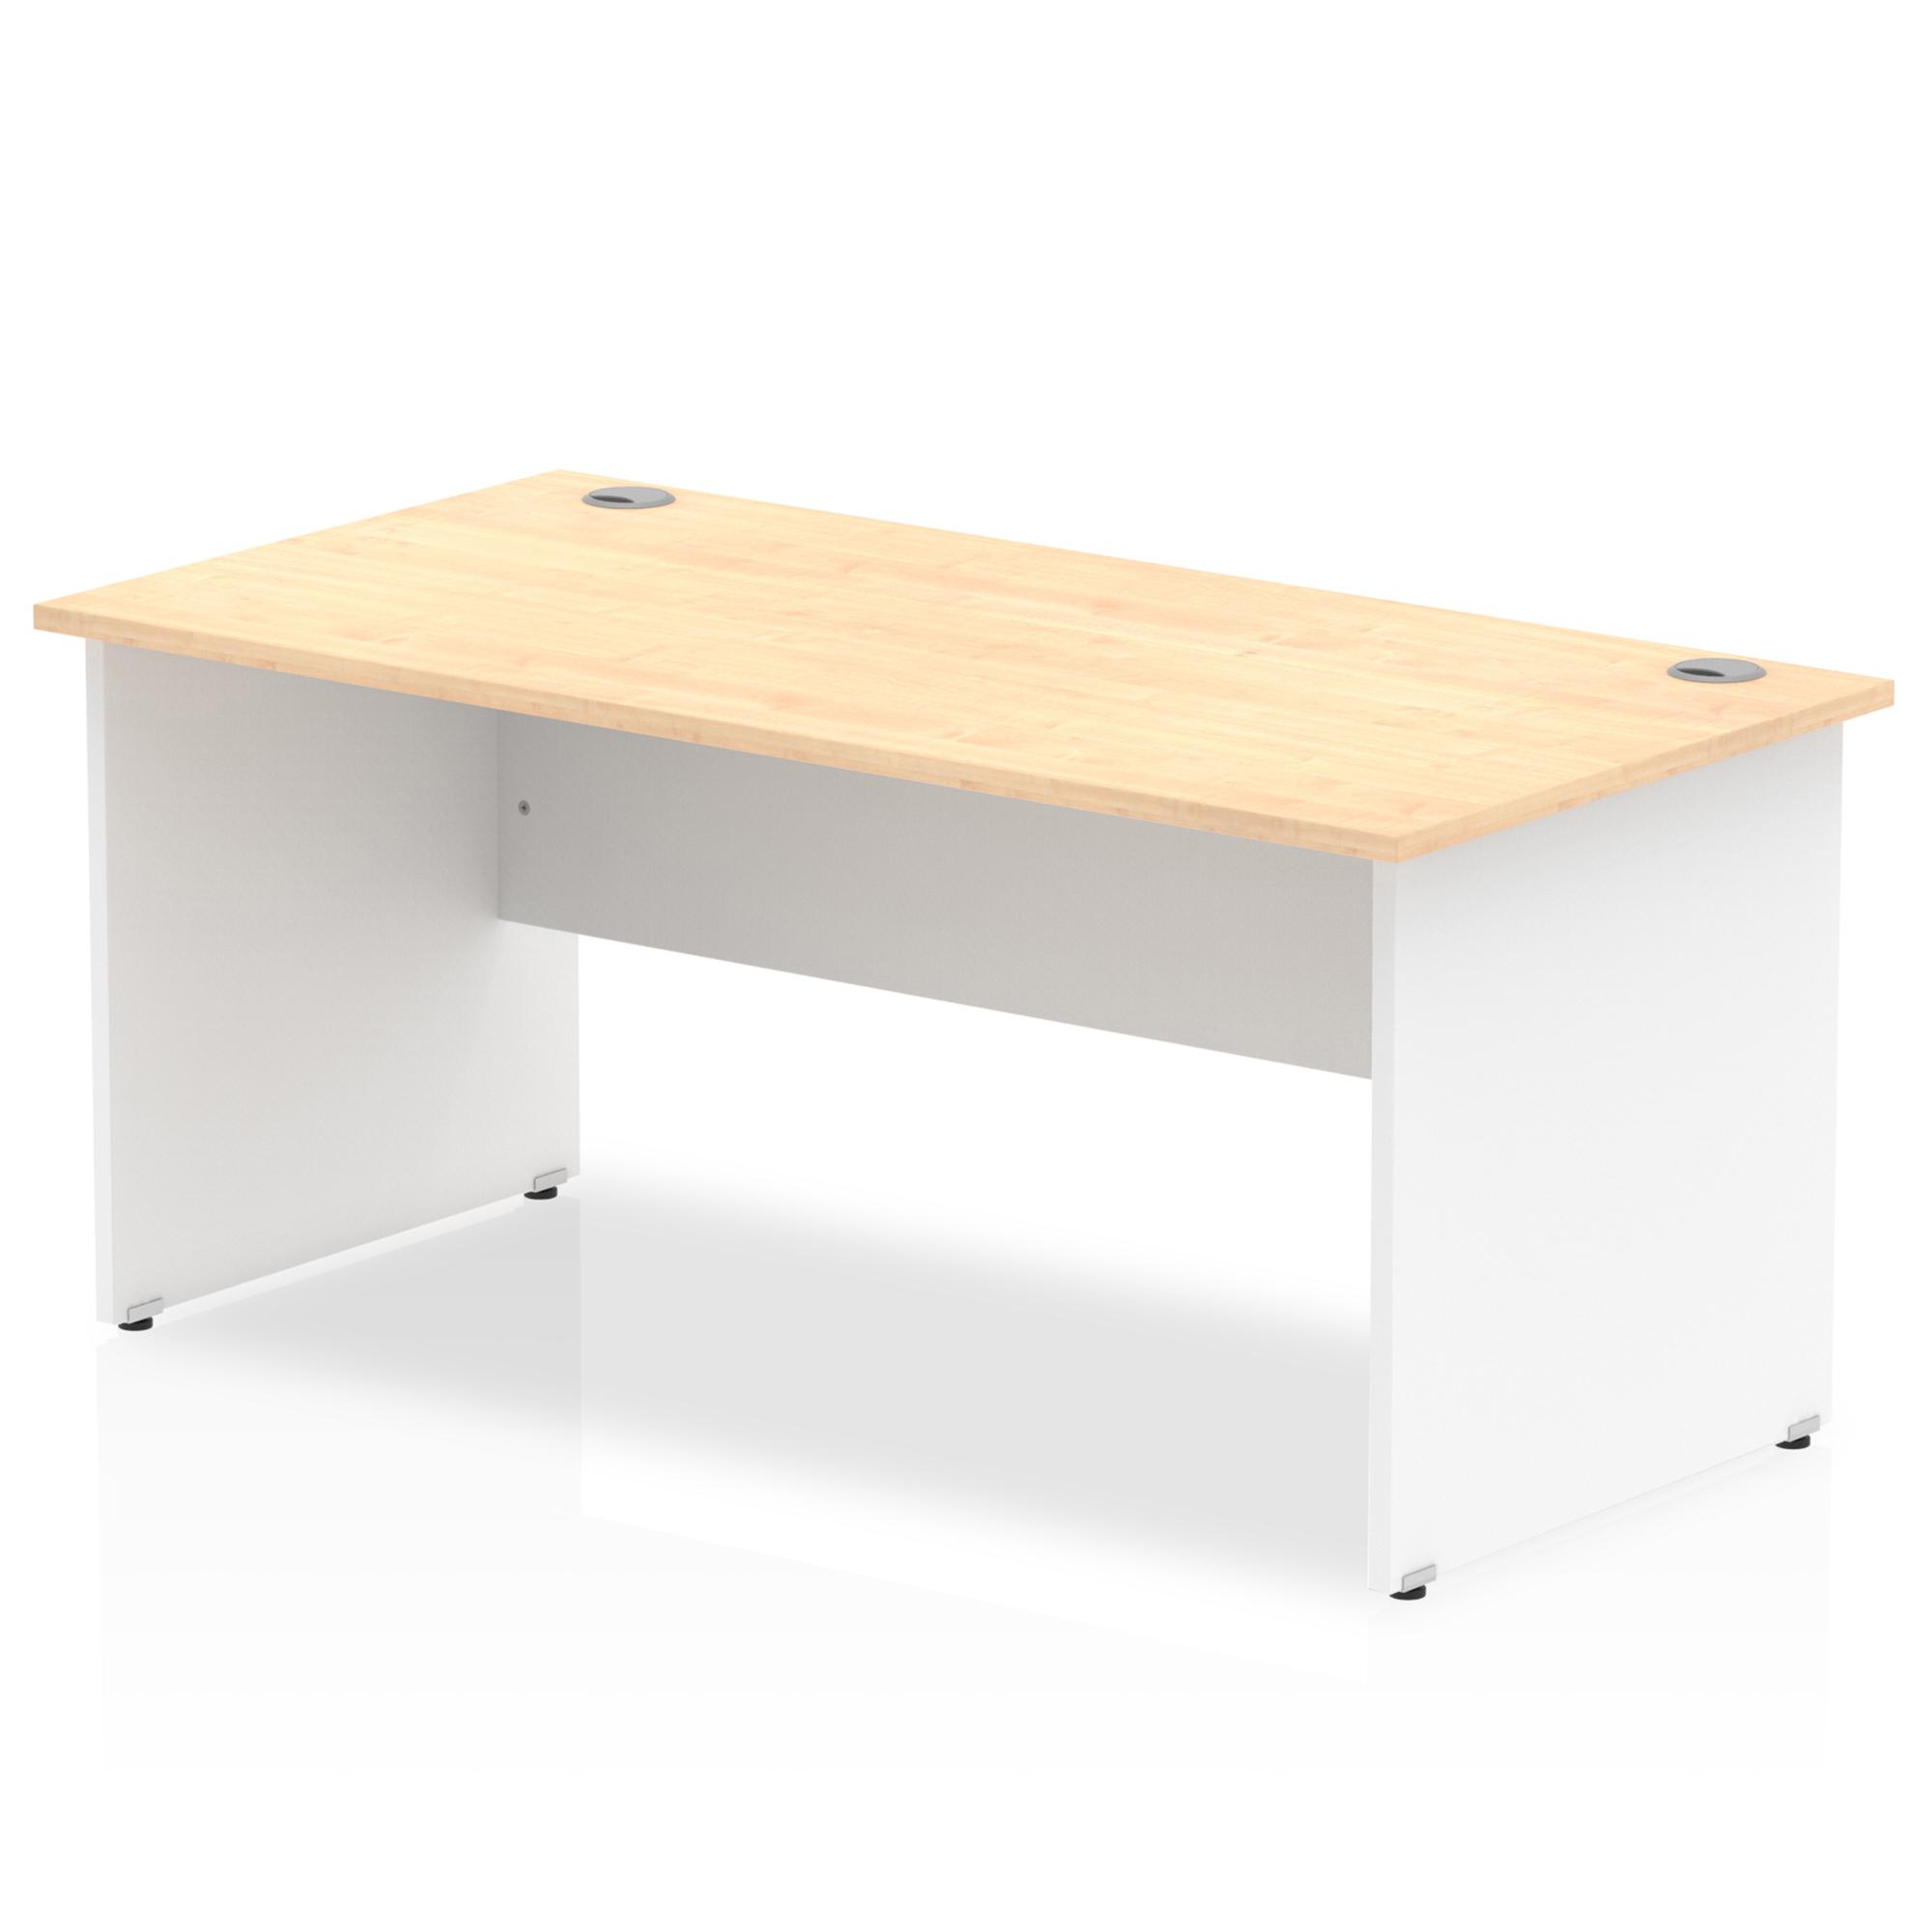 Trexus Desk Rectangle Panel End 1600x800mm Maple Top White Panels Ref TT000111